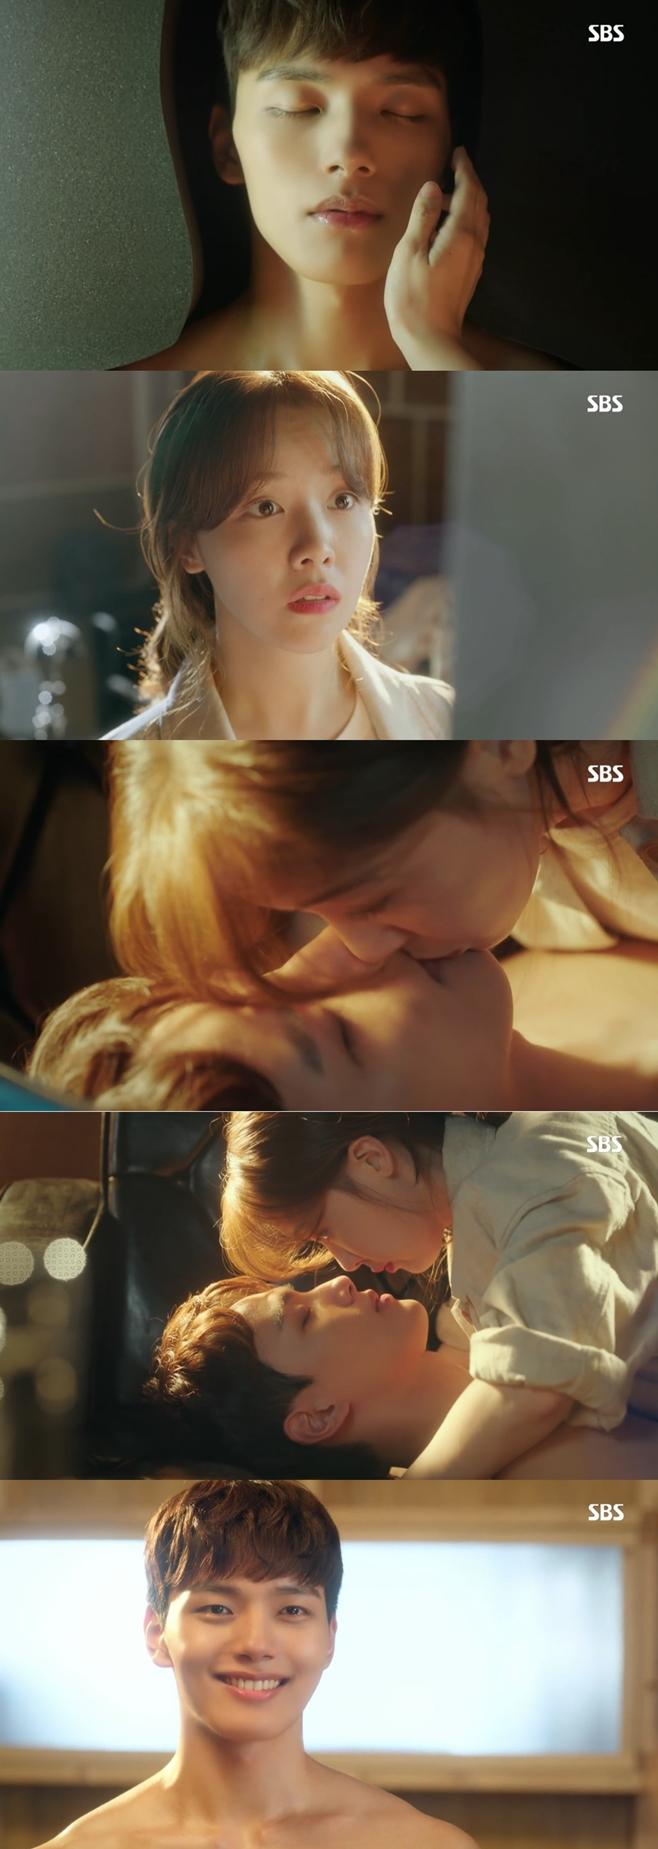 SBS 절대그이, 여진구 방민아 홍종현